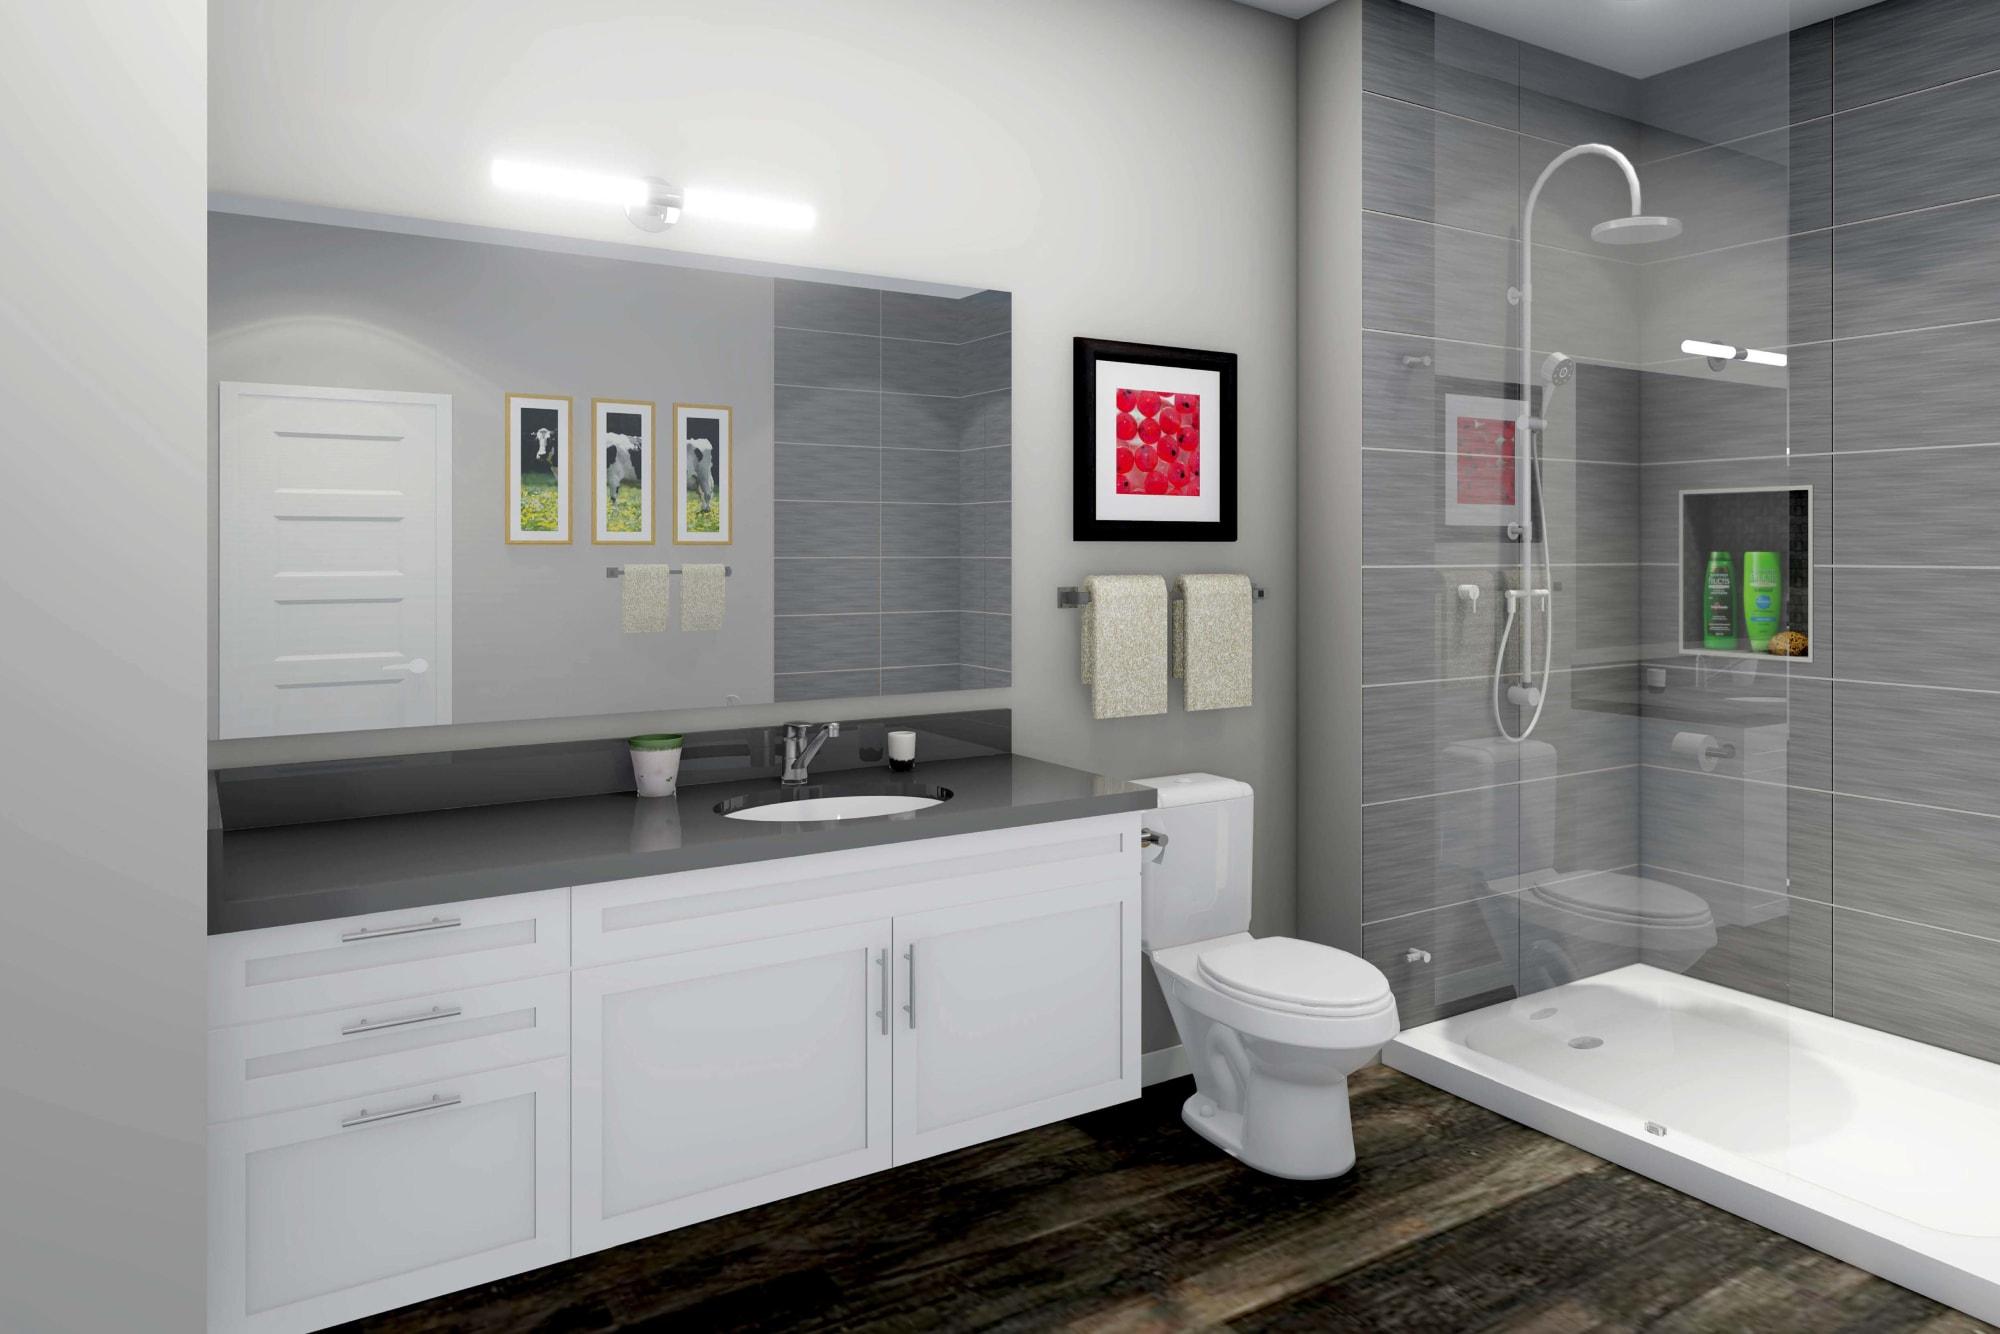 Rendering of New Build Bathroom, White Cabinetry, Oversized Shower, Quartz Countertops